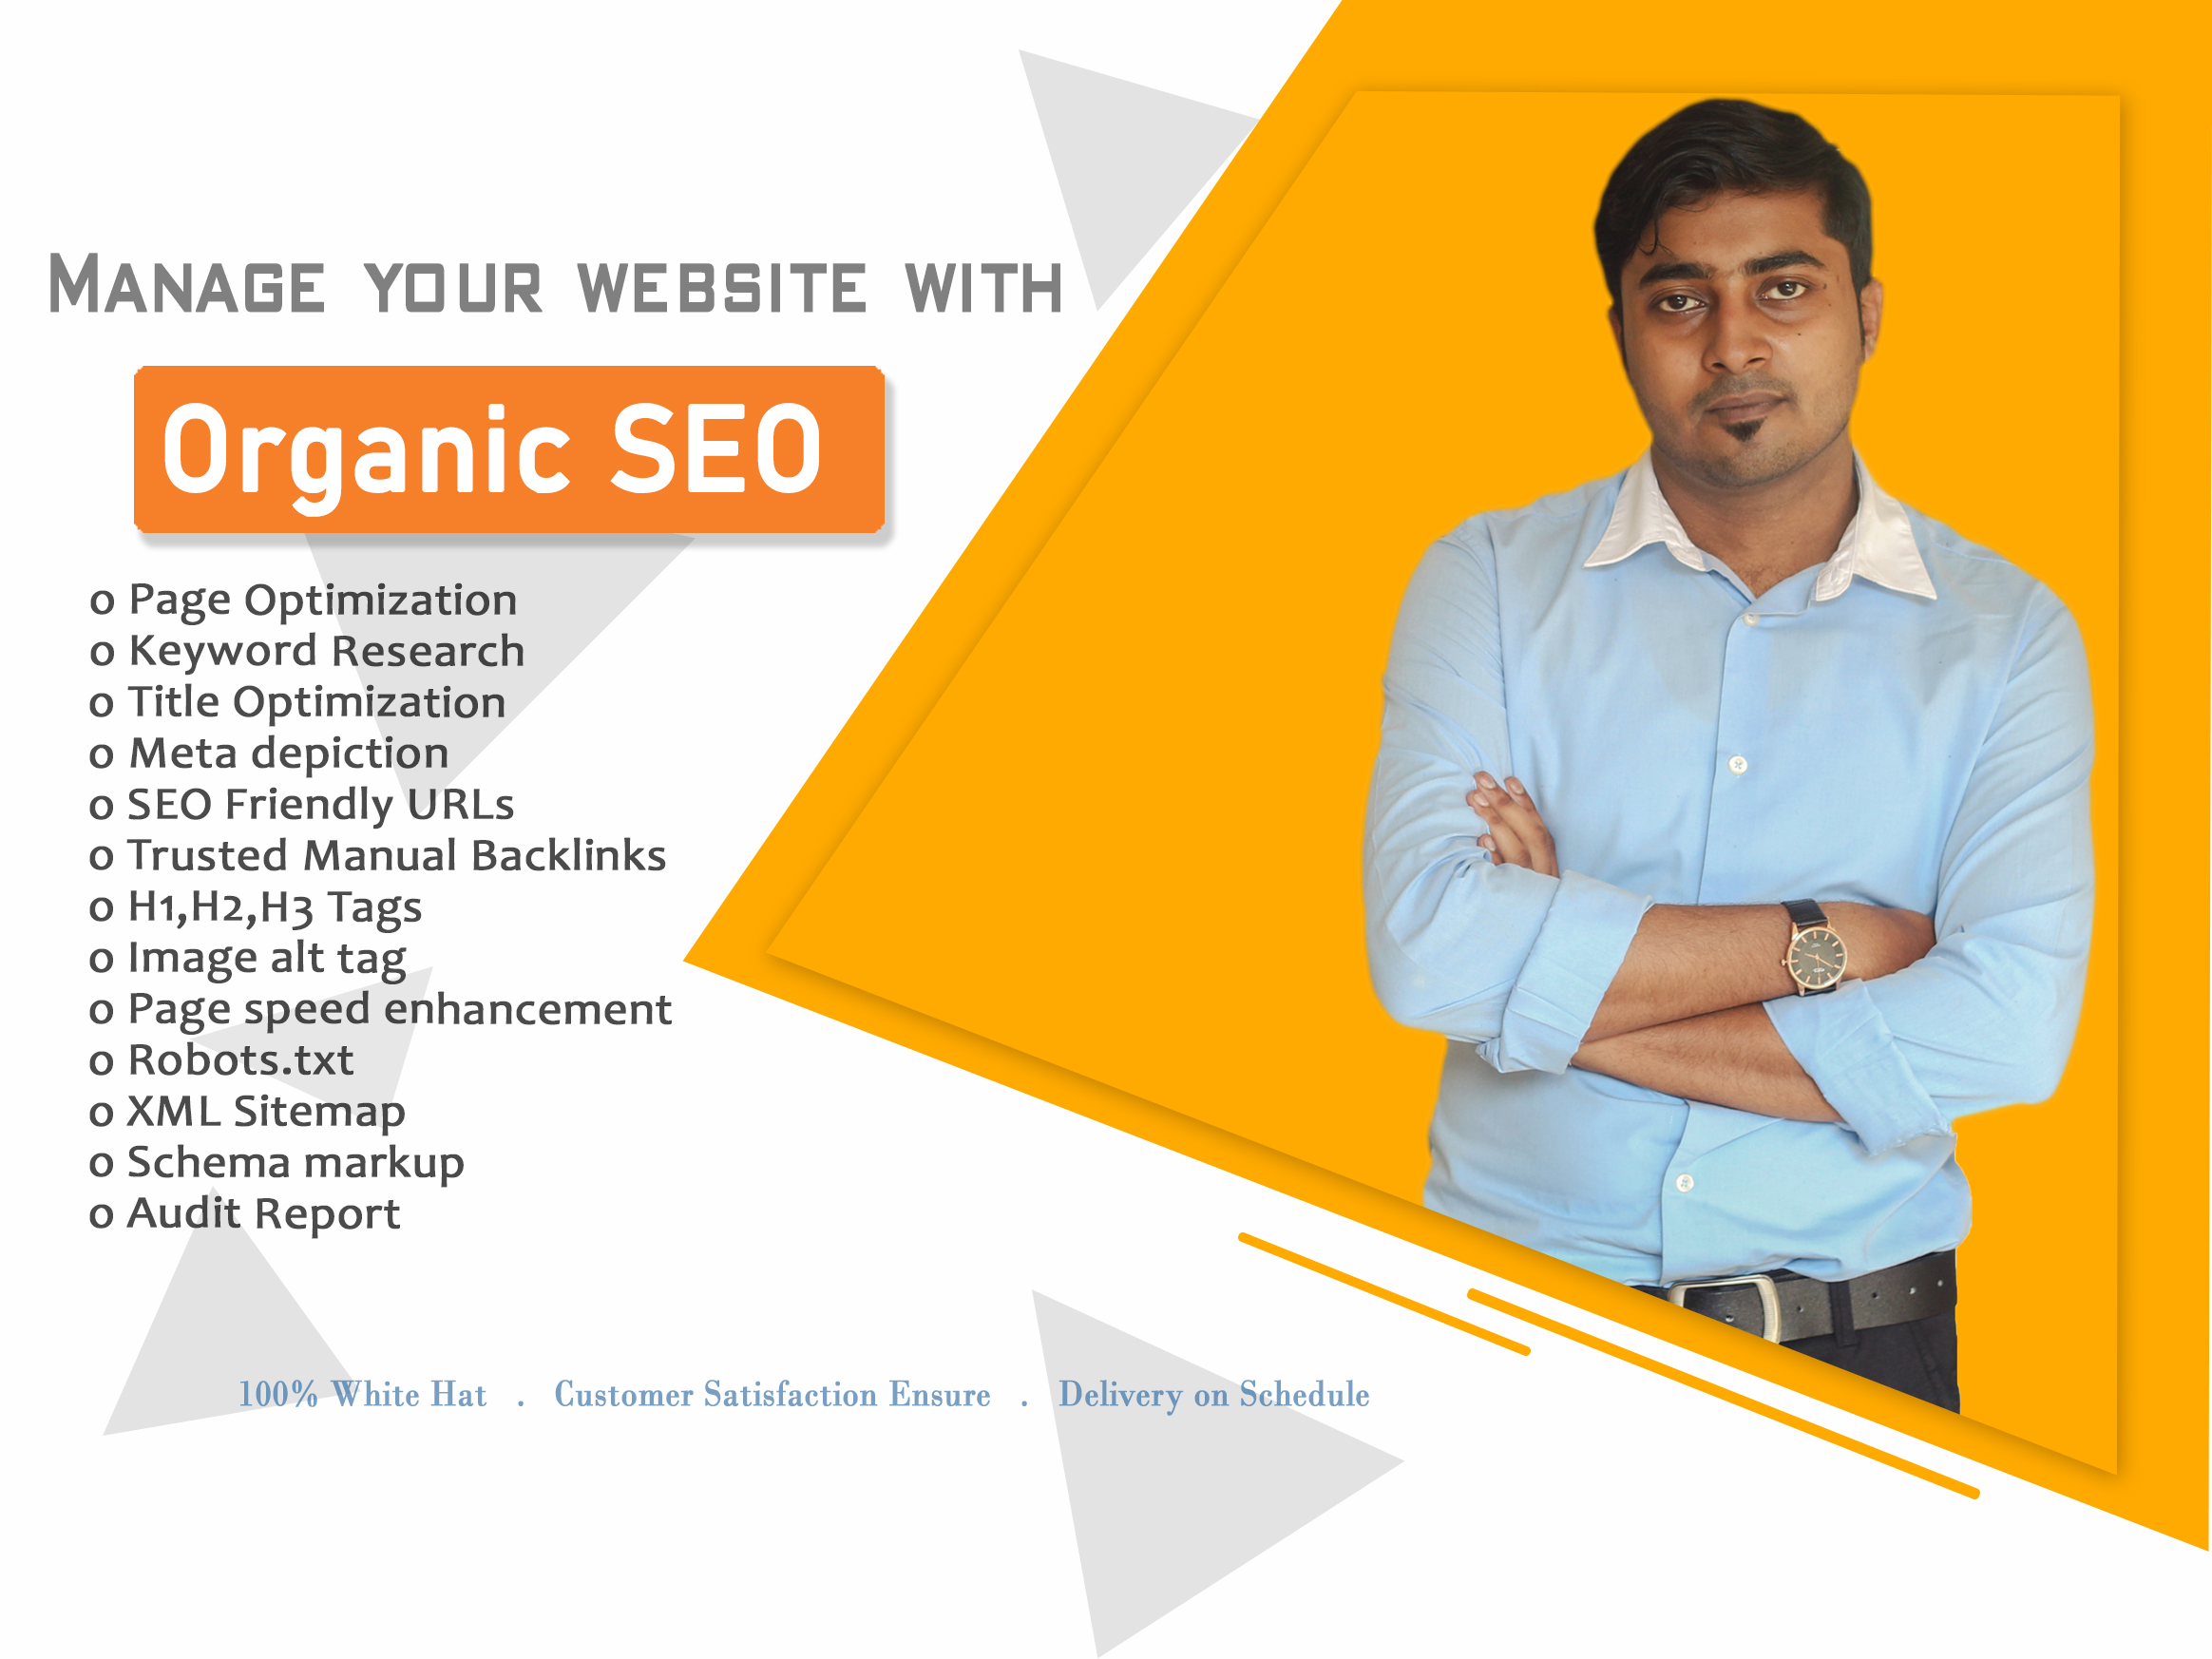 onpage wordpress SEO and technical on page optimization